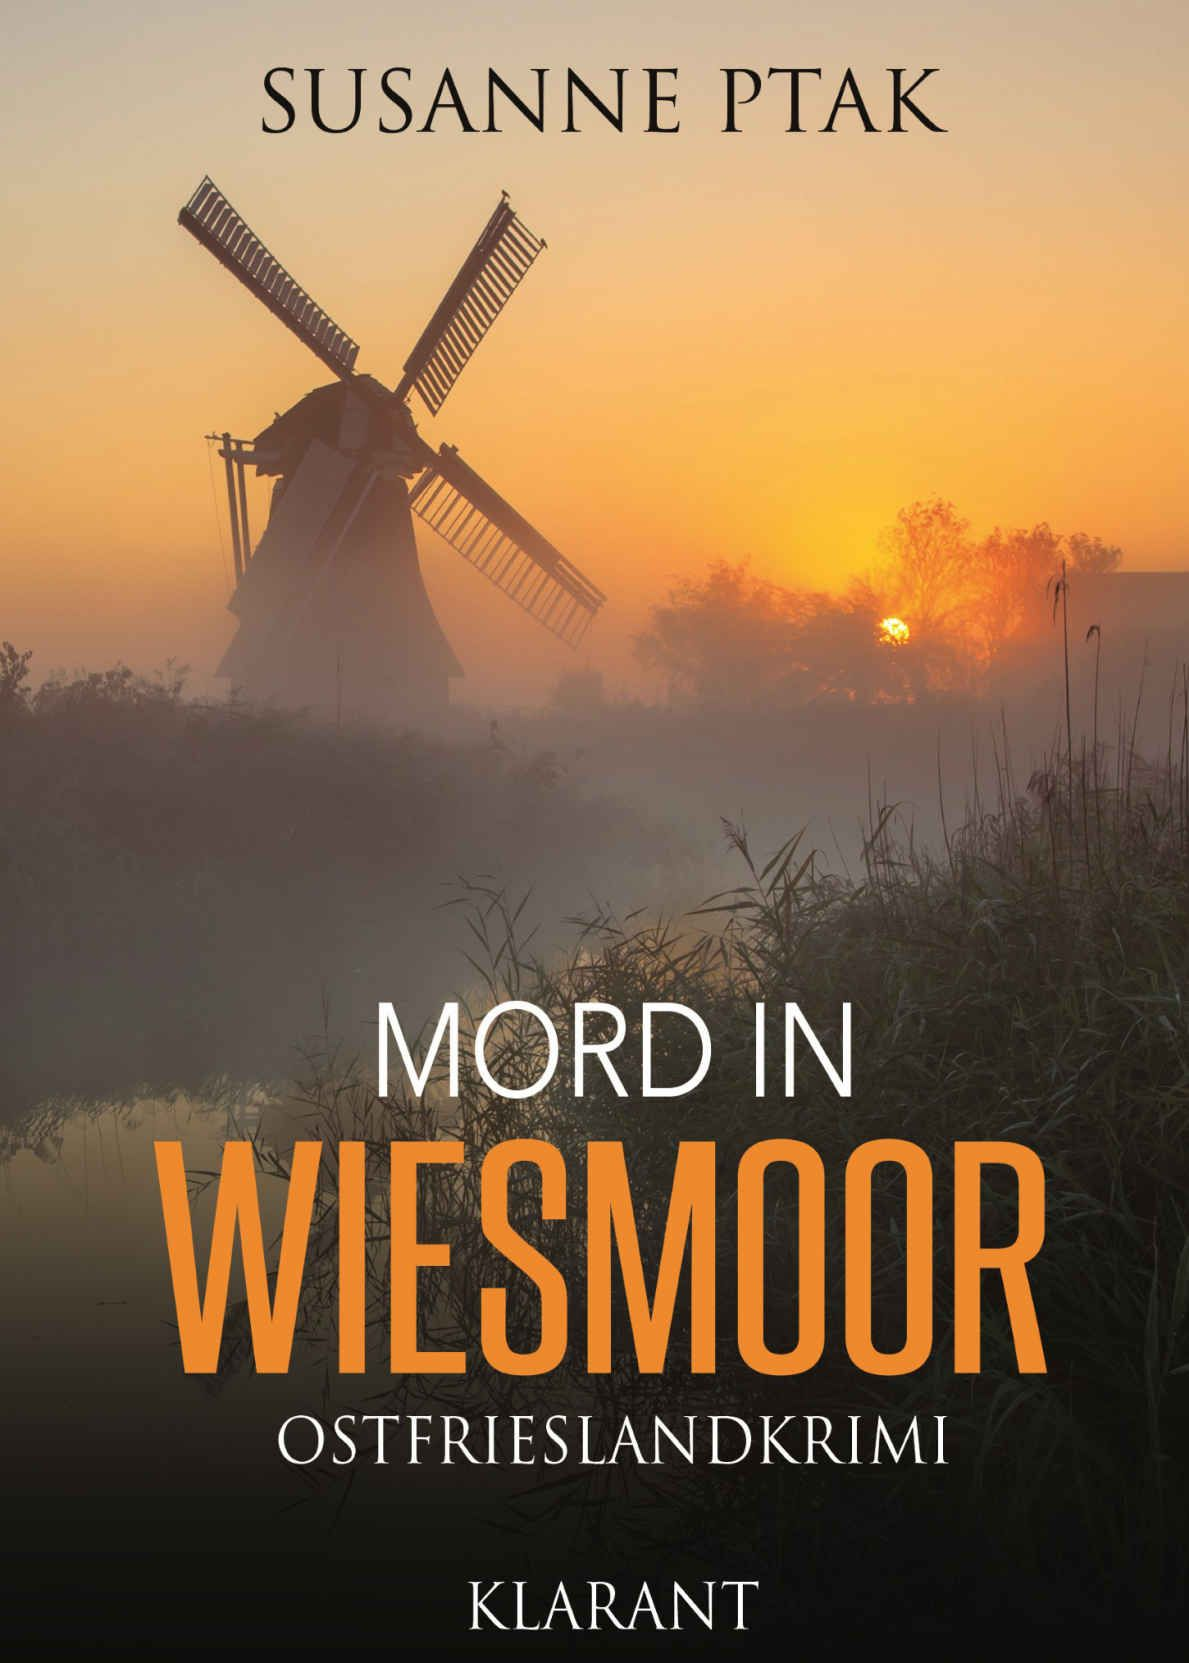 Amazon.com: Mord in Wiesmoor. Ostfrieslandkrimi (German Edition) eBook: Susanne Ptak: Kindle Store